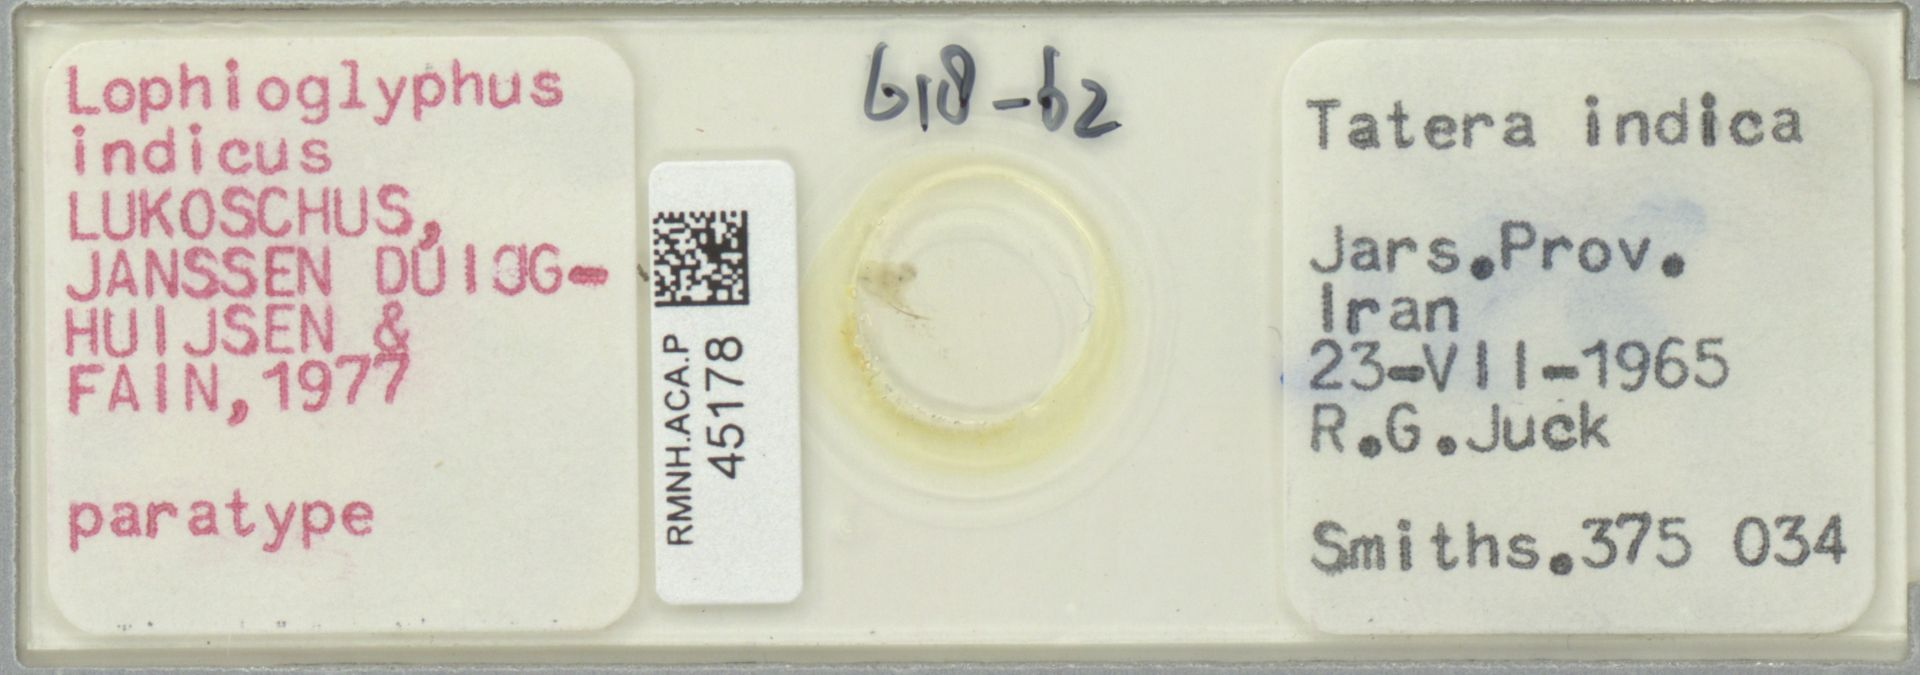 RMNH.ACA.P.45178 | Lophioglyphus indicus Lukoschus, Janssen Duijghuijsen & Fain, 1977